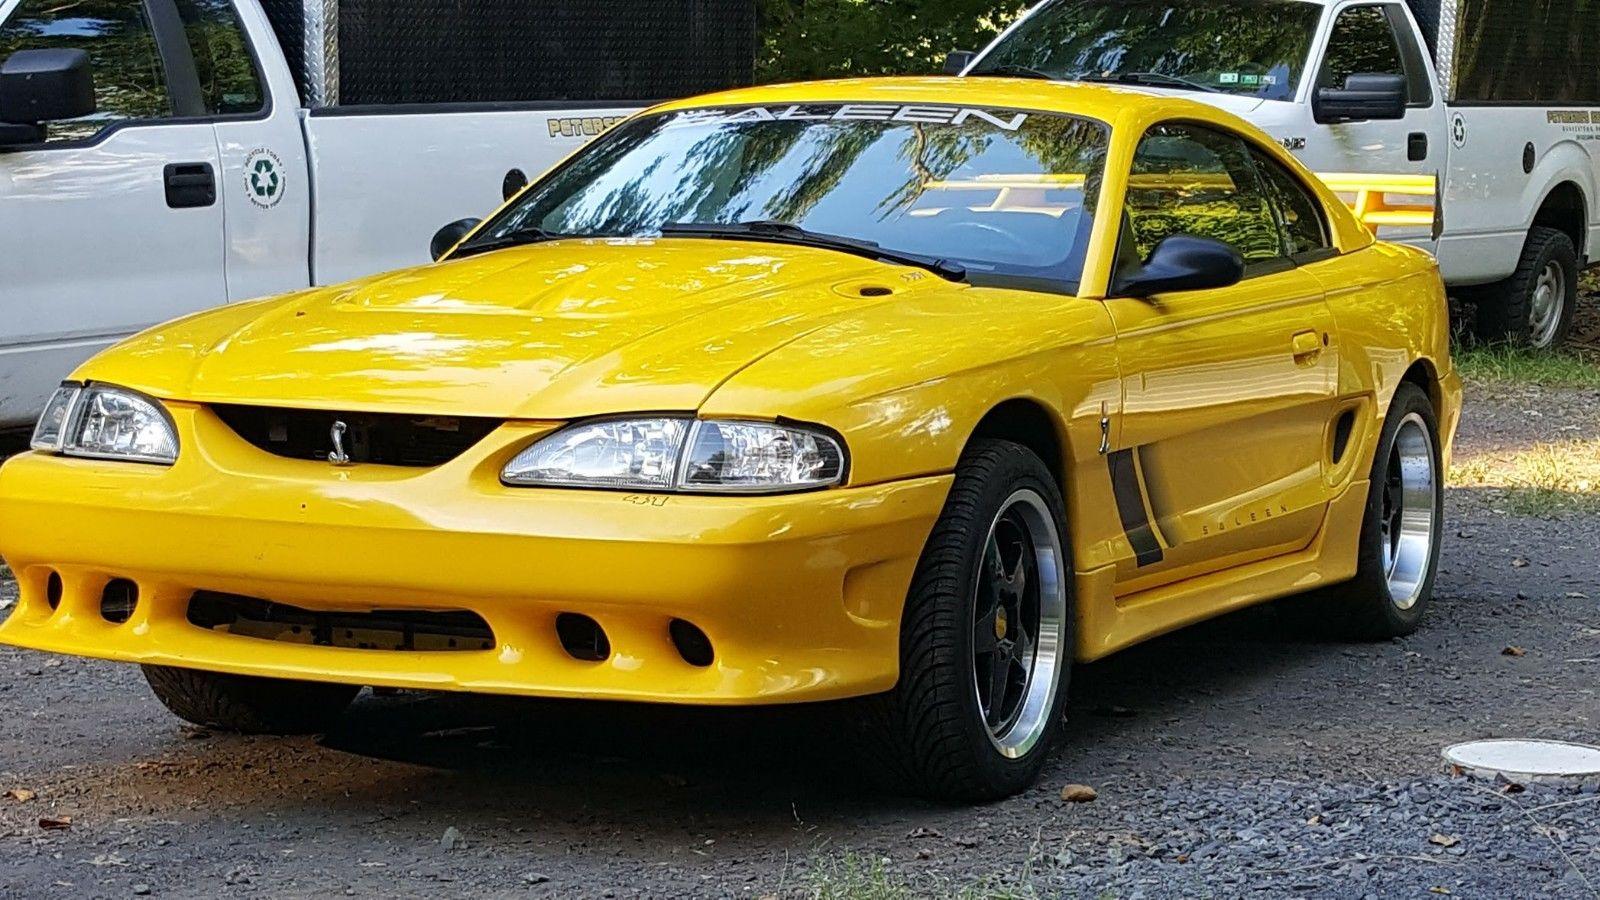 Amazing 1998 ford mustang svt cobra 1998 cobra svt black black 342353kall new max ms suspensionnew fm catbackexh 2018